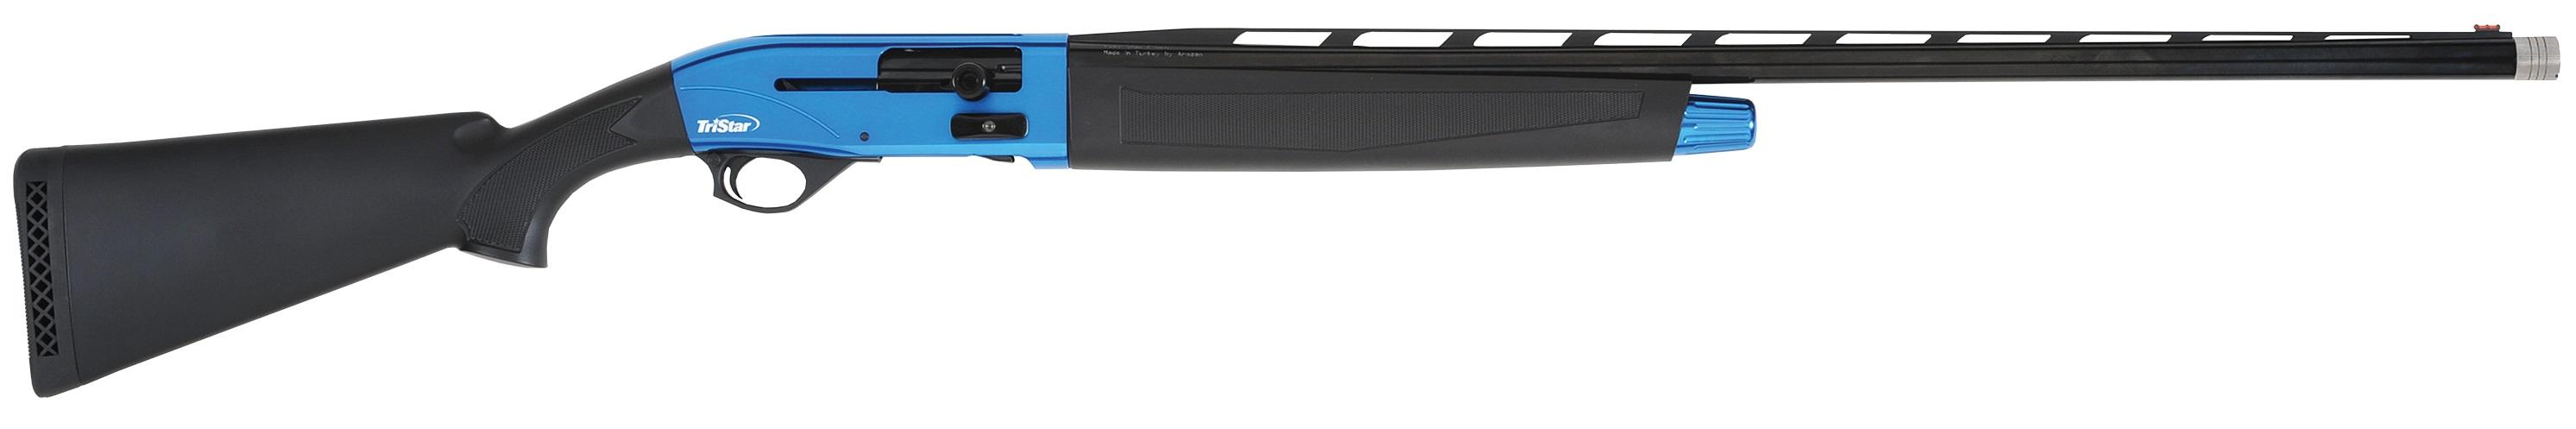 TriStar Sporting Arms VIPER G2 SR SPORT 12 GAUGE